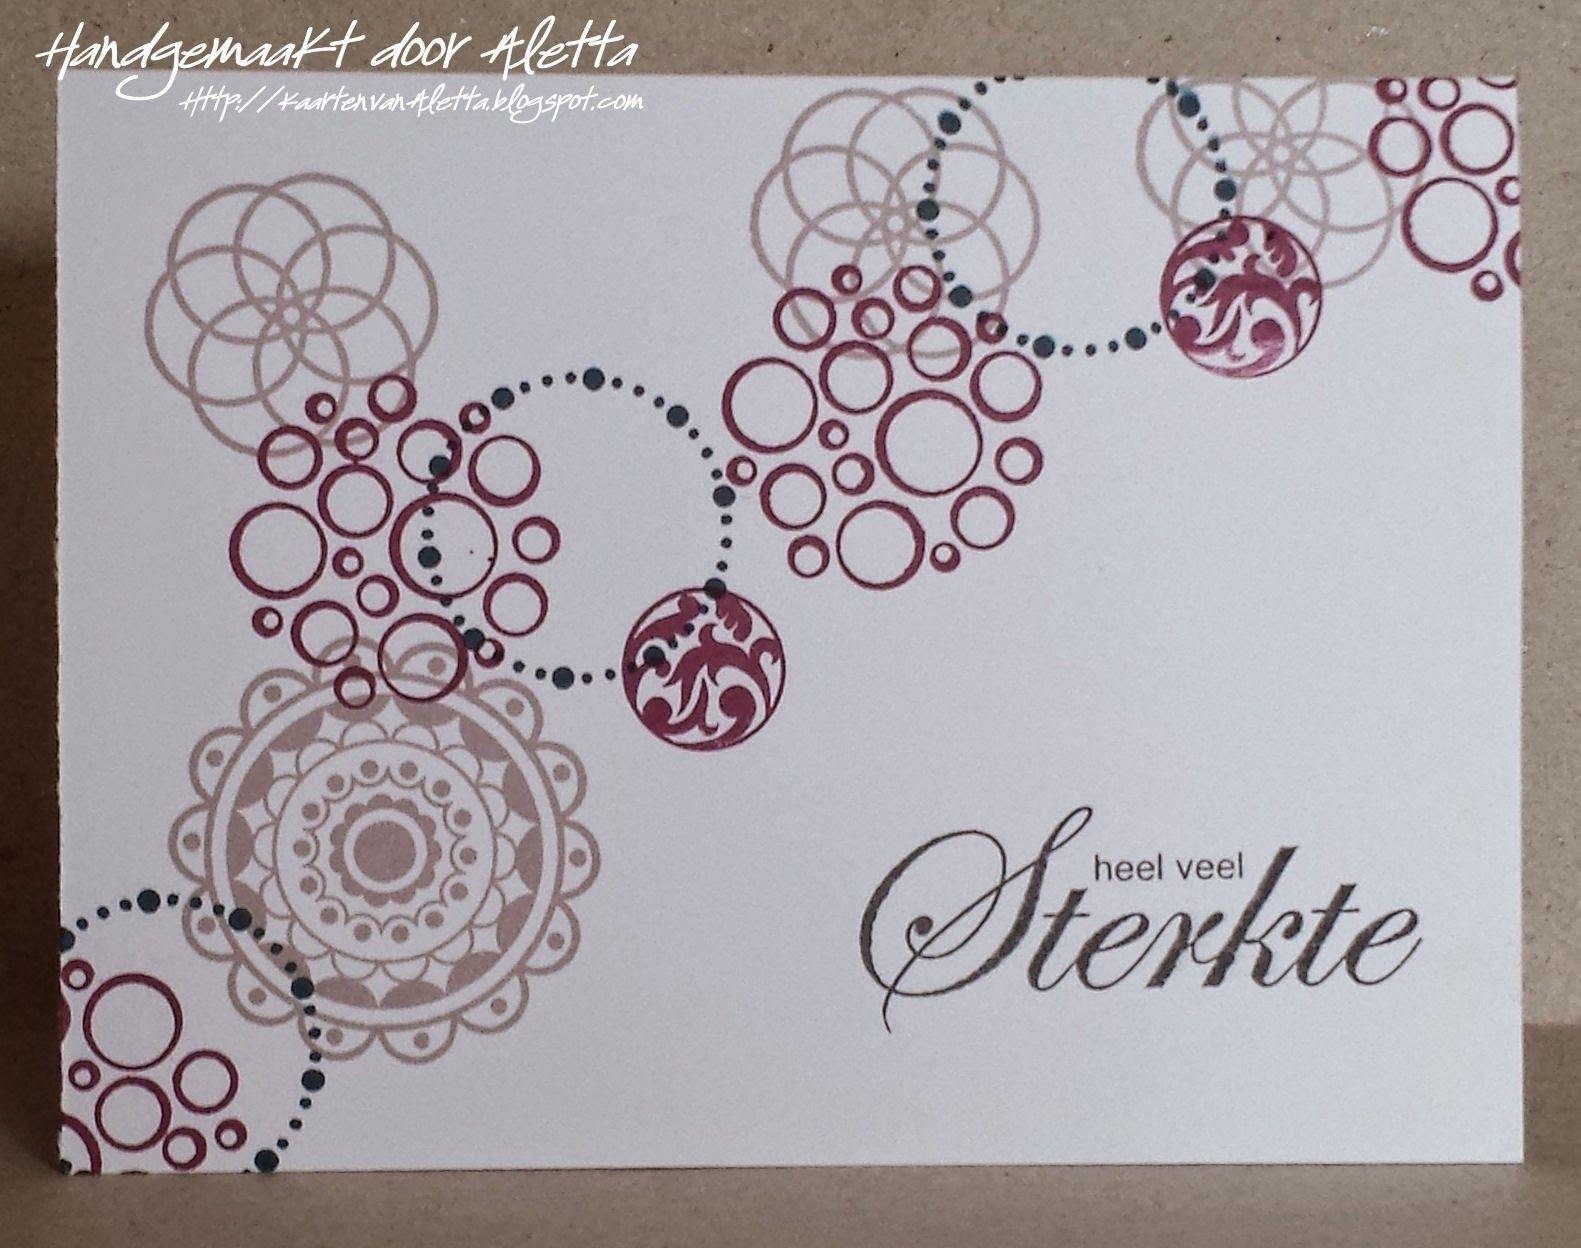 Handmade by Aletta